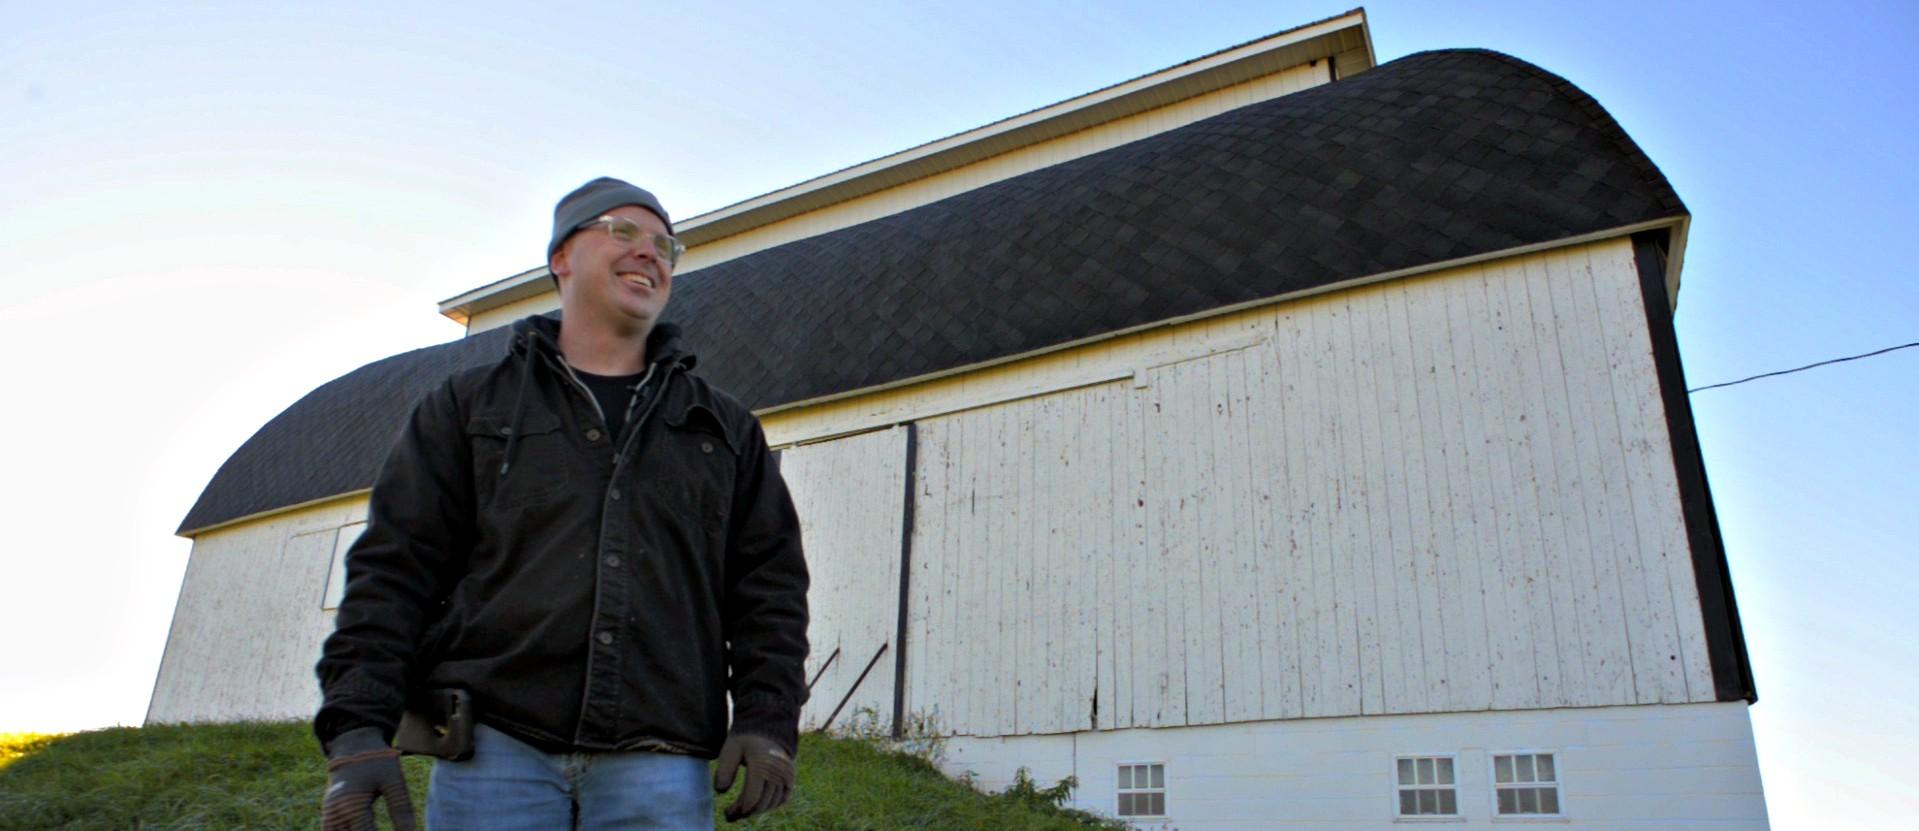 jimmy-barnwood-hovey-in-front-of-barn.jpg